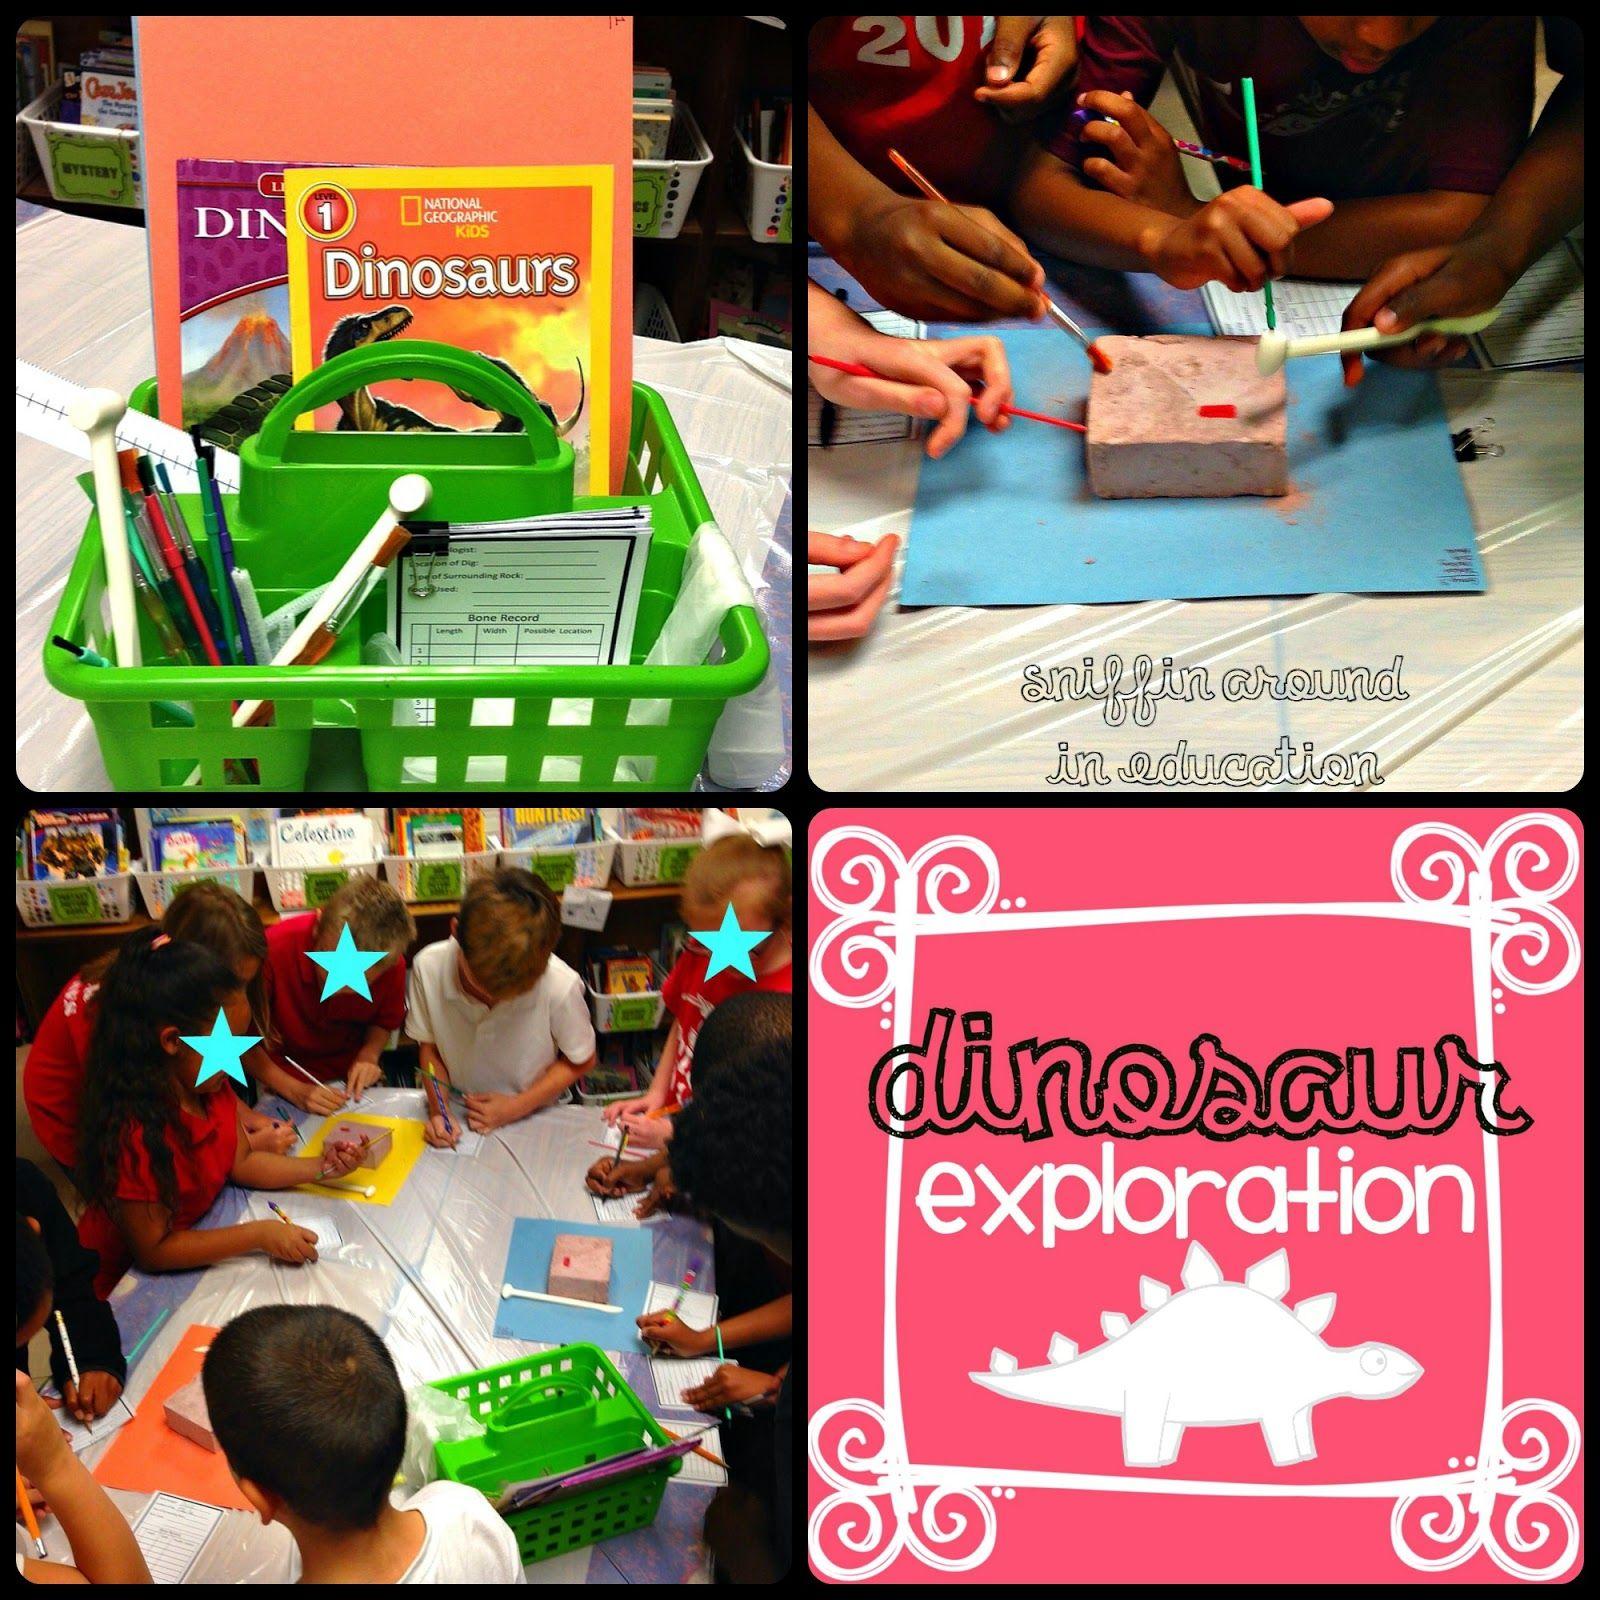 Dinosaur Fossils Exploration 3rd Grade Sniffin Around In